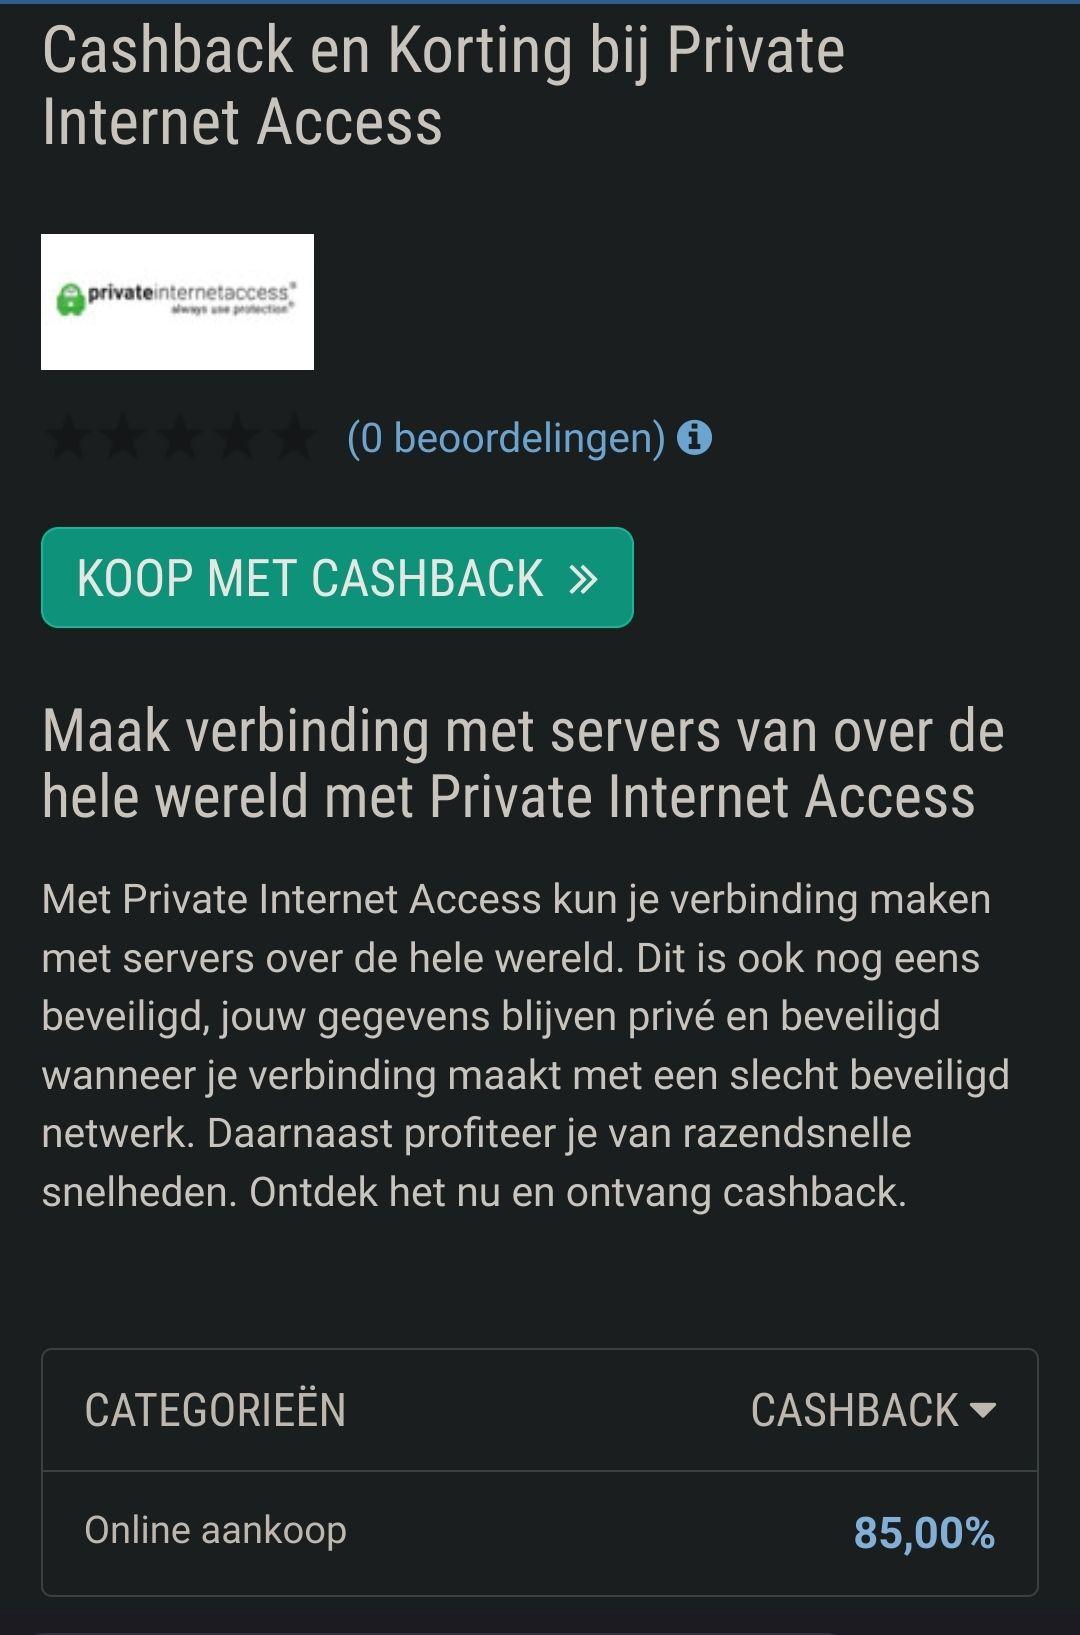 PIA private internet access vpn 3 JAAR